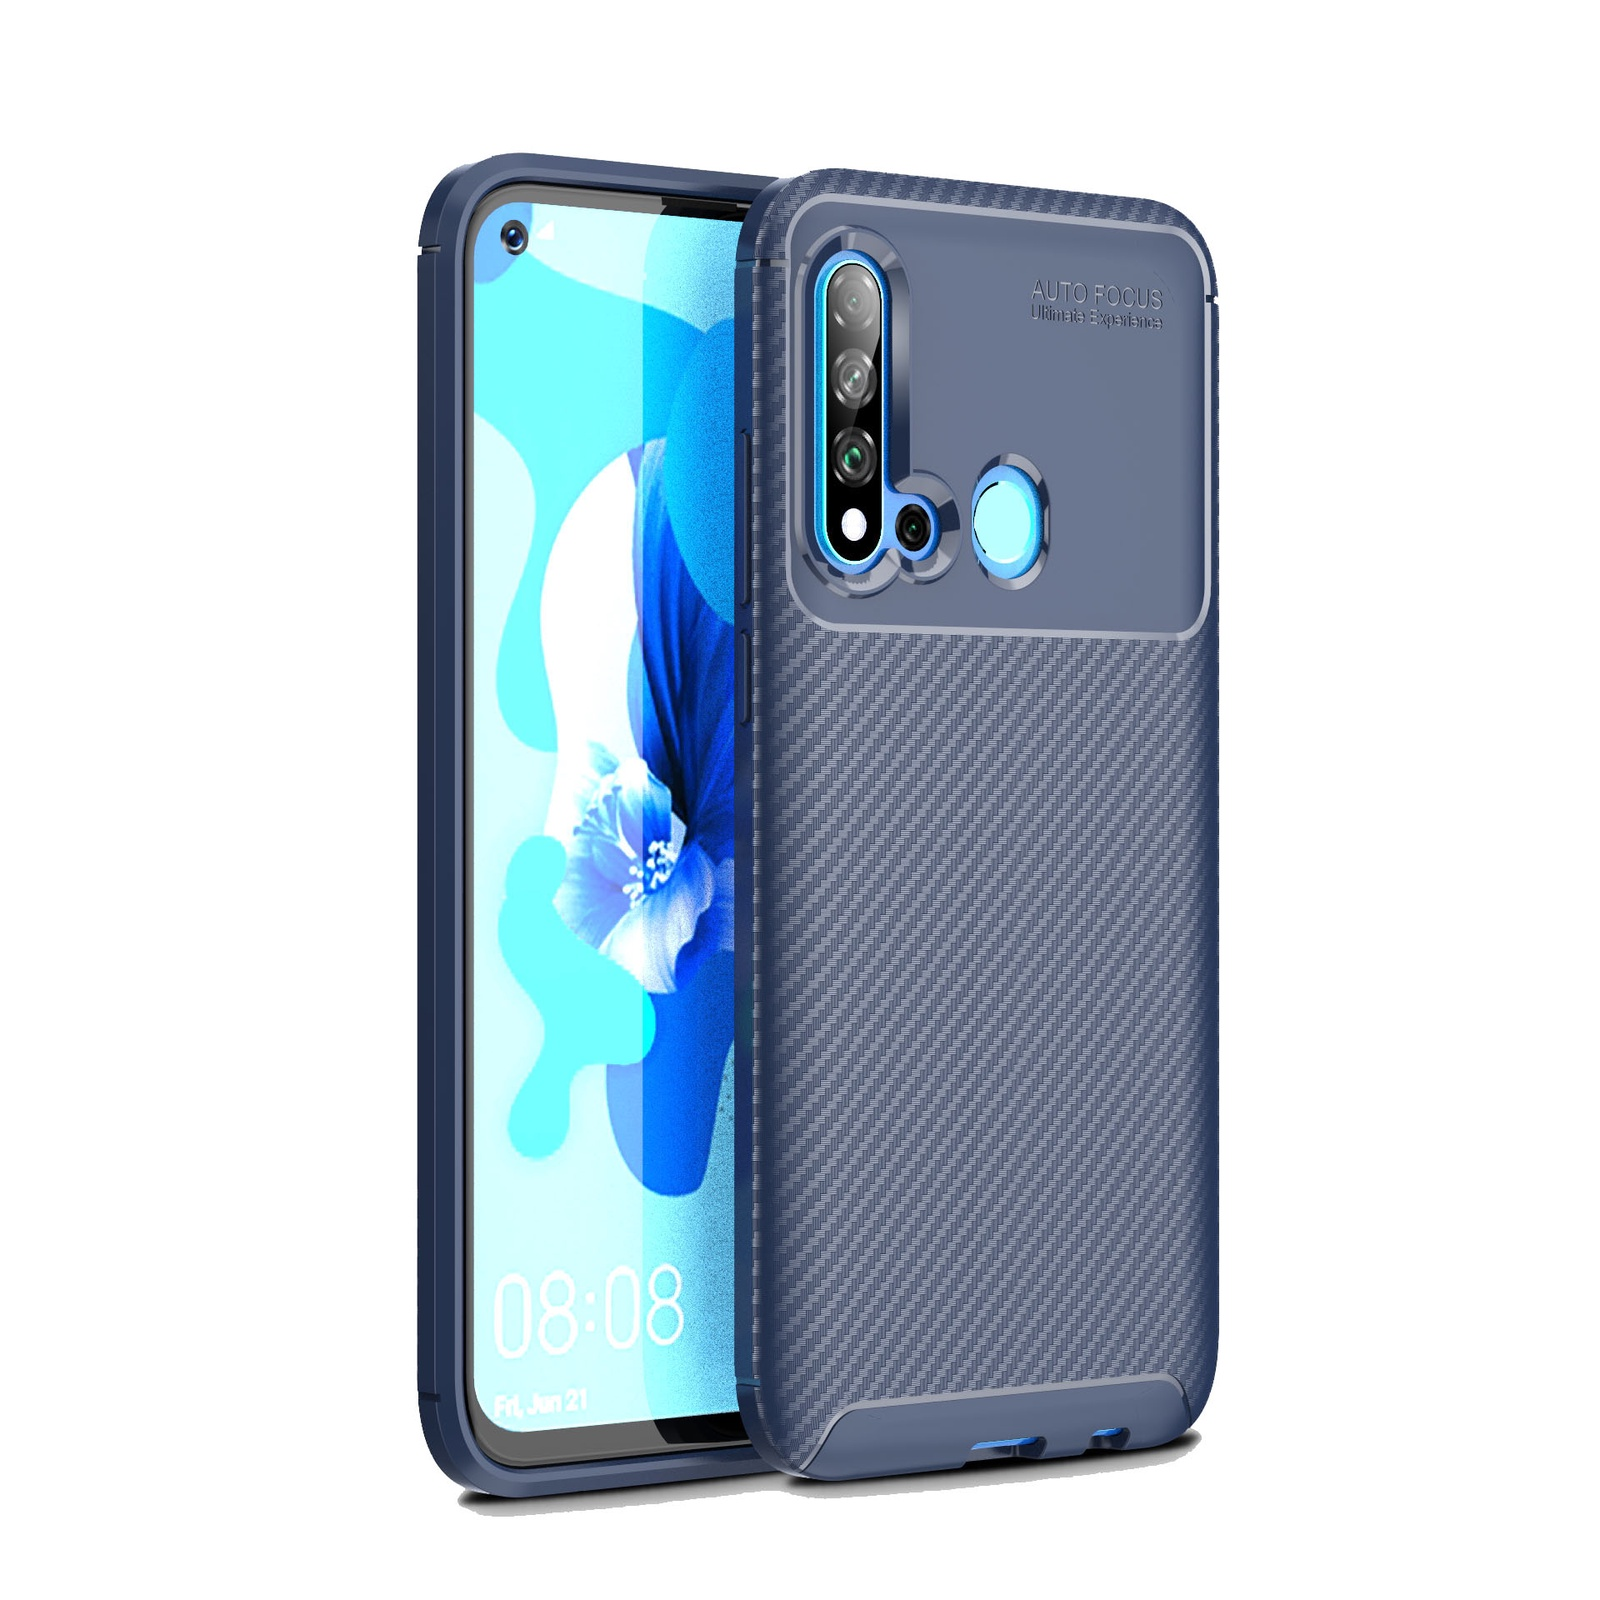 Для Huawei Honor 10i чехол синий Мягкий ТПУ/углеродное волокно узор грязеотталкивающий ударопрочный чехол для телефона задняя защита чехол